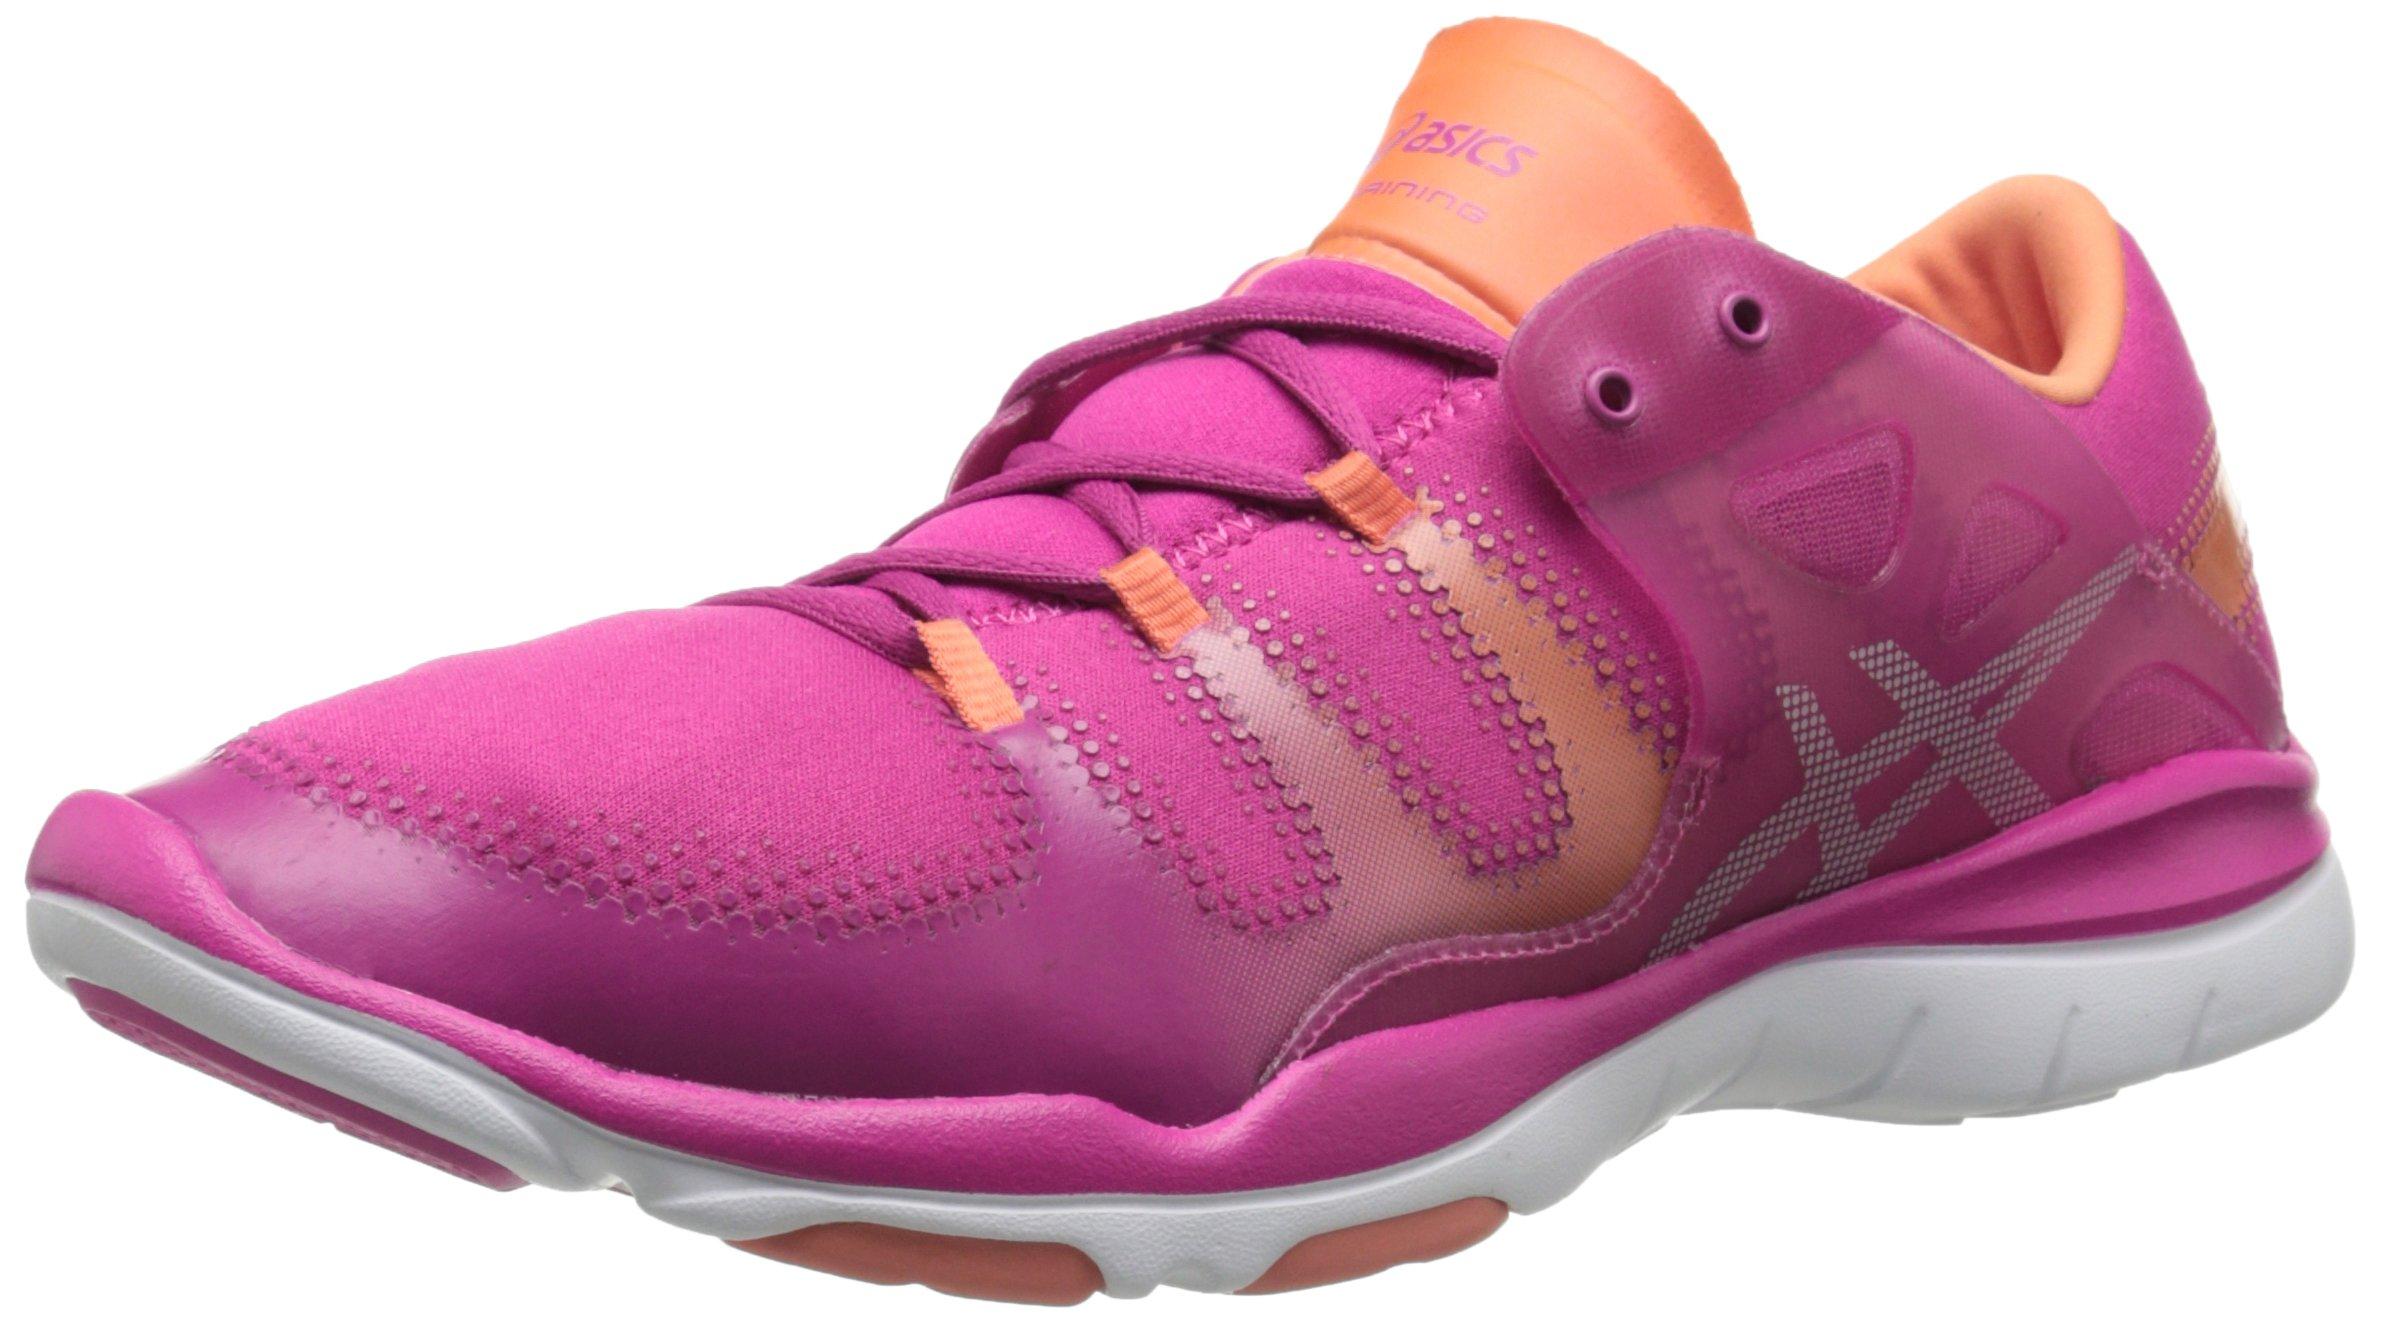 ASICS Women's Gel Fit Vida Fitness Shoe, Berry/Silver/Melon, 9.5 M US